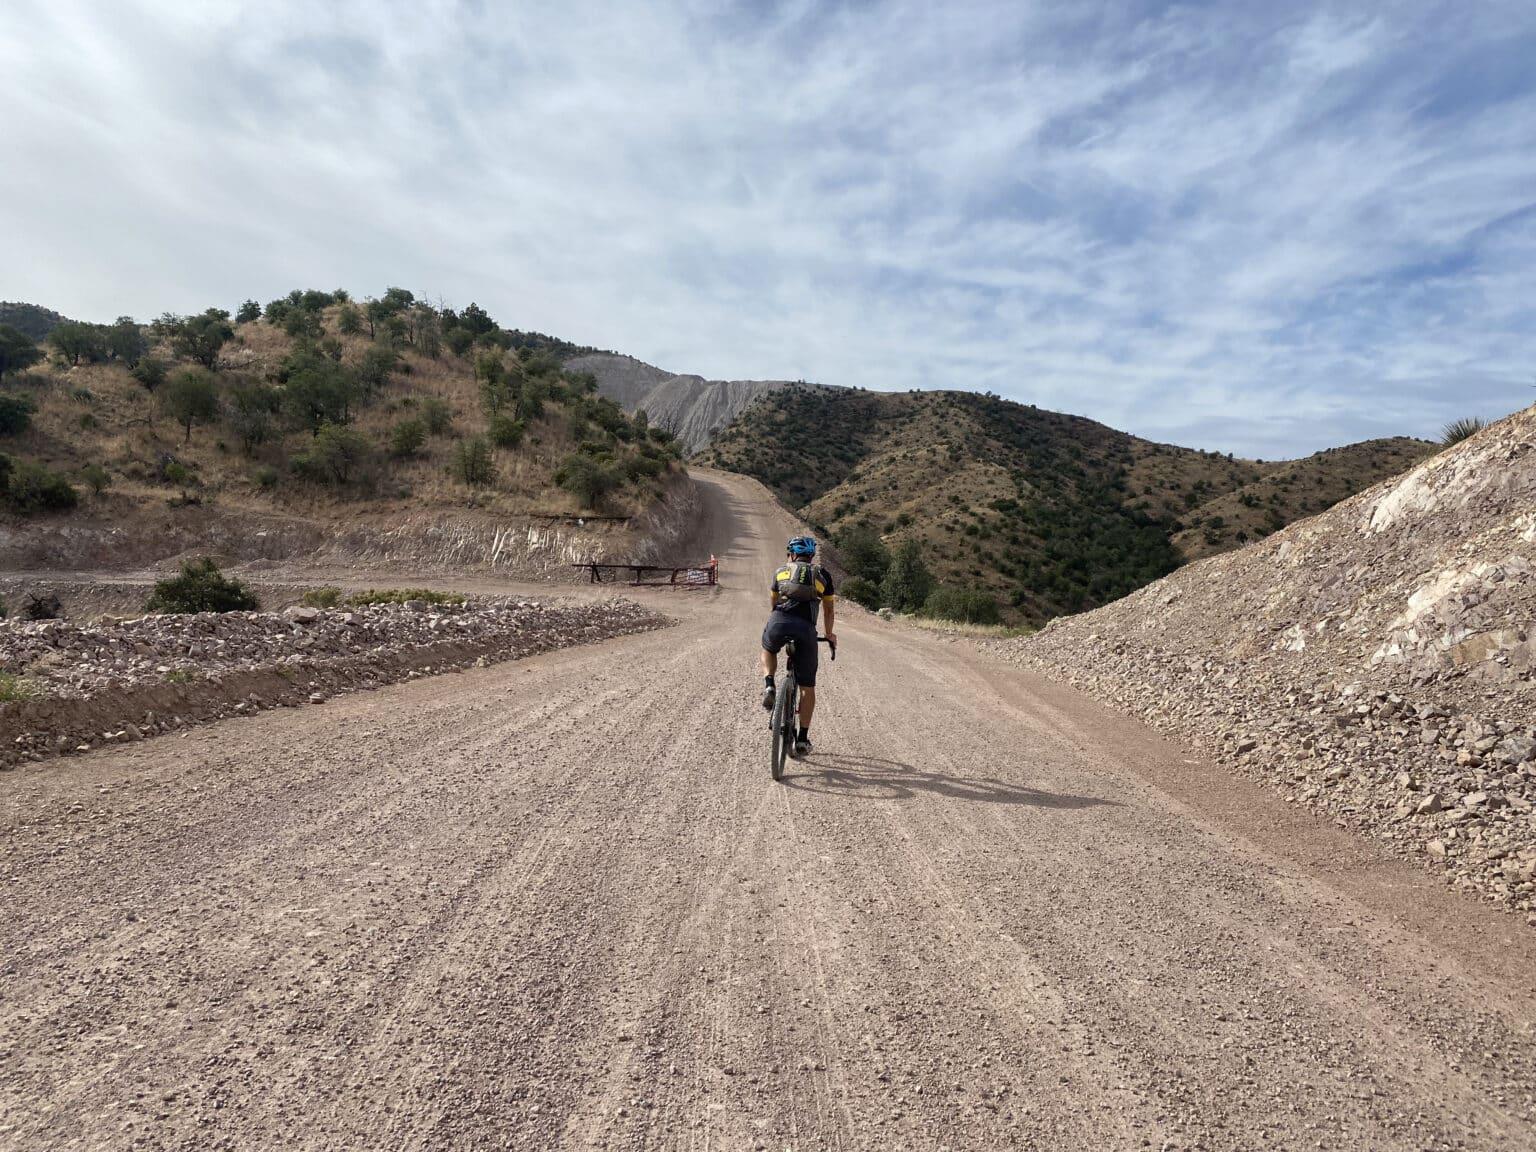 Bike along gravel road near Nogales, Mexico.